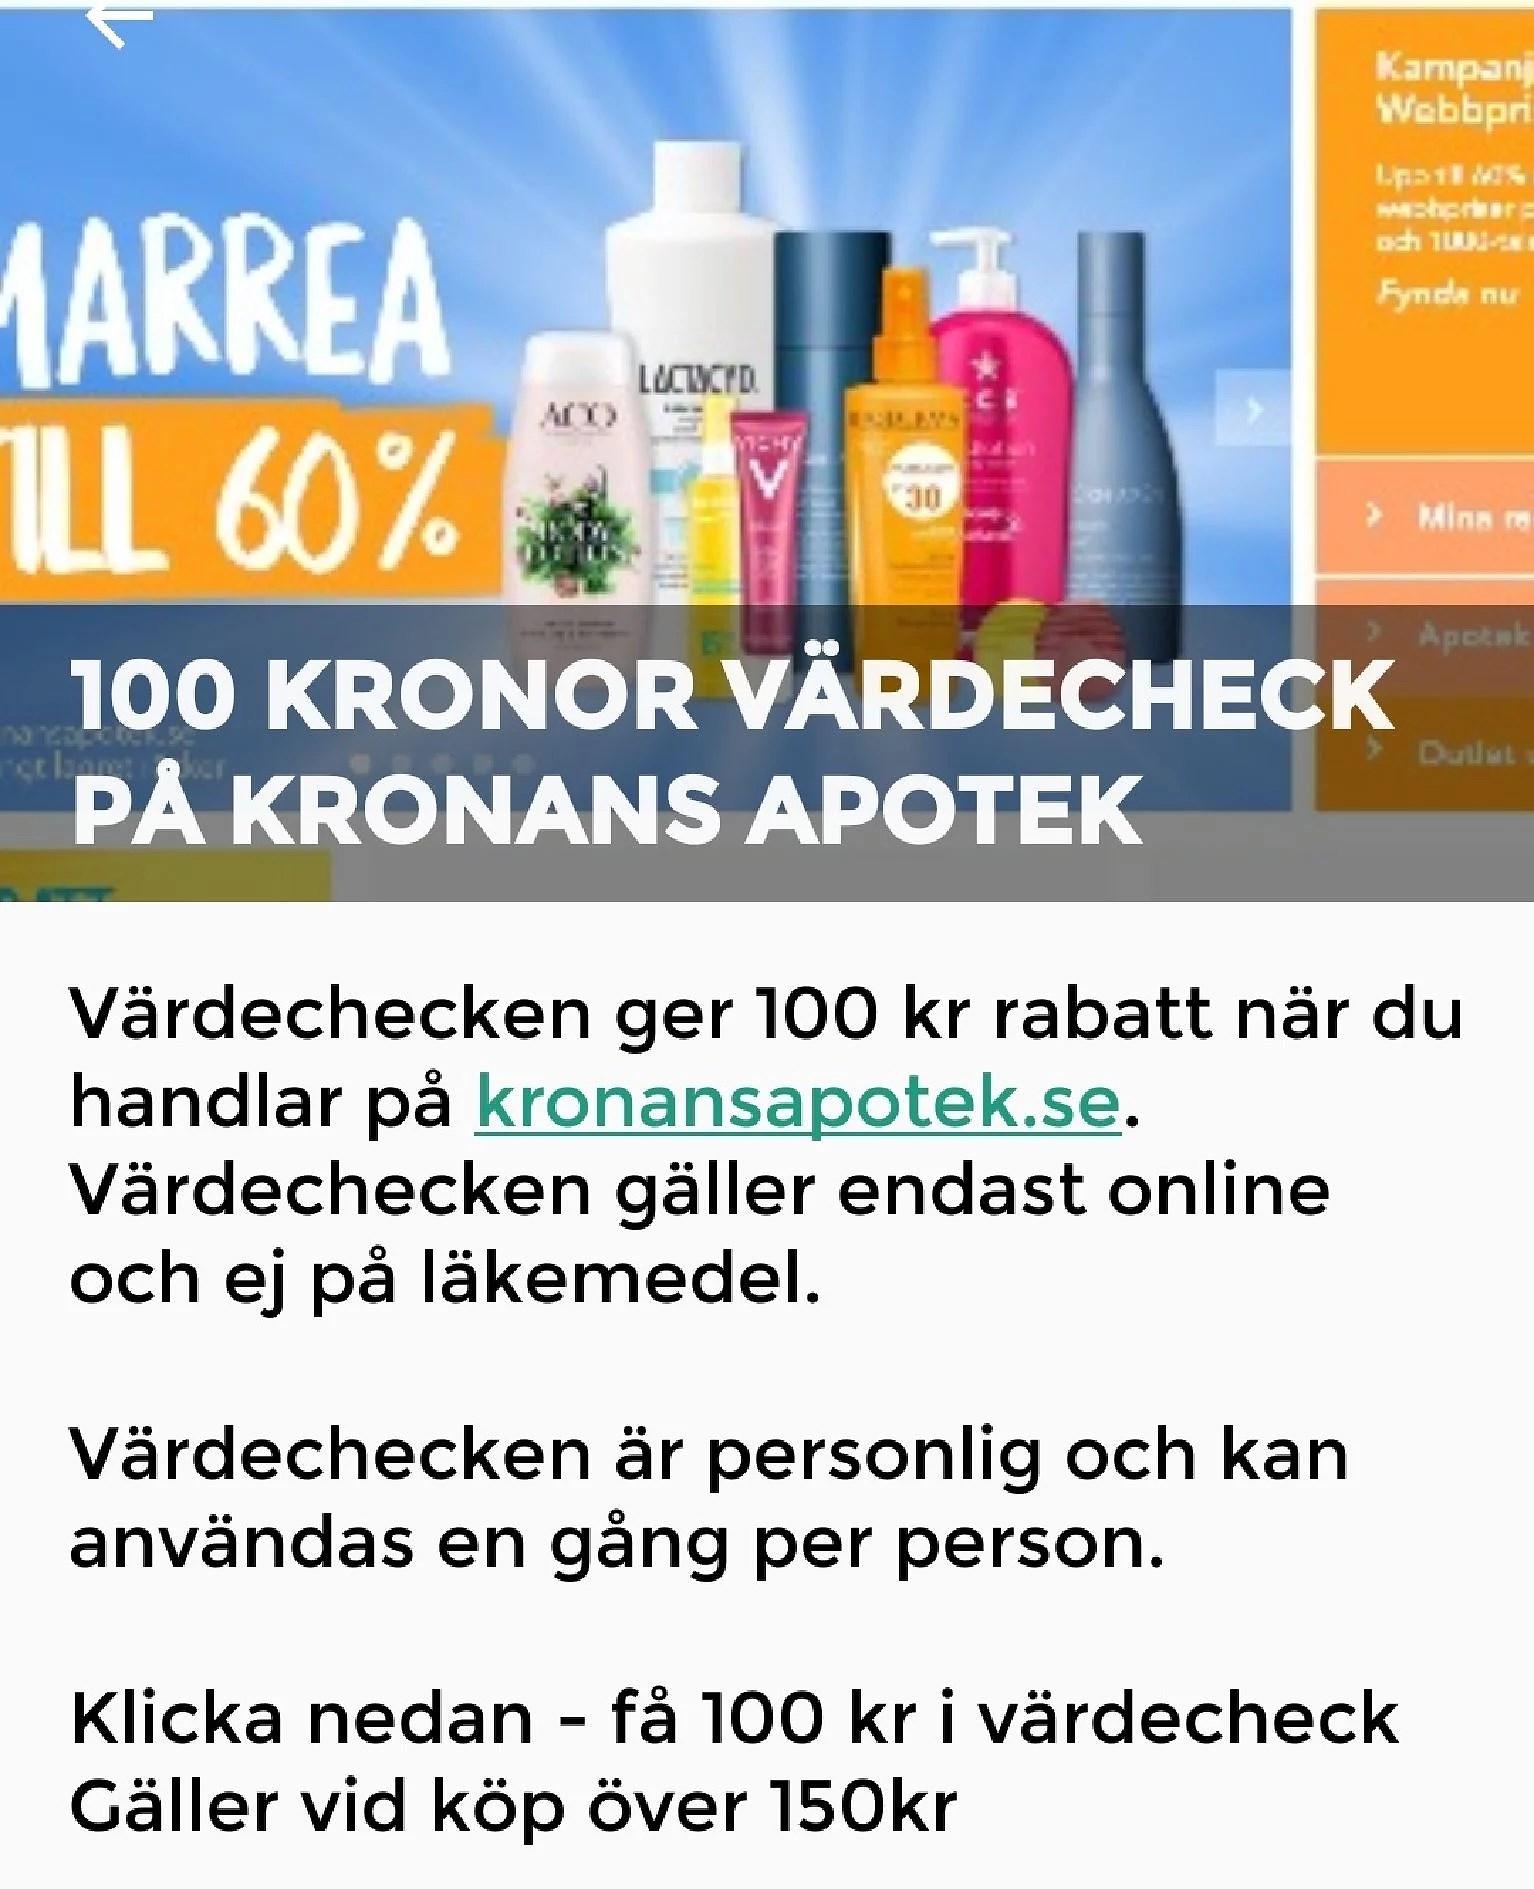 Få 100 kr rabatt på Kronans Apotek